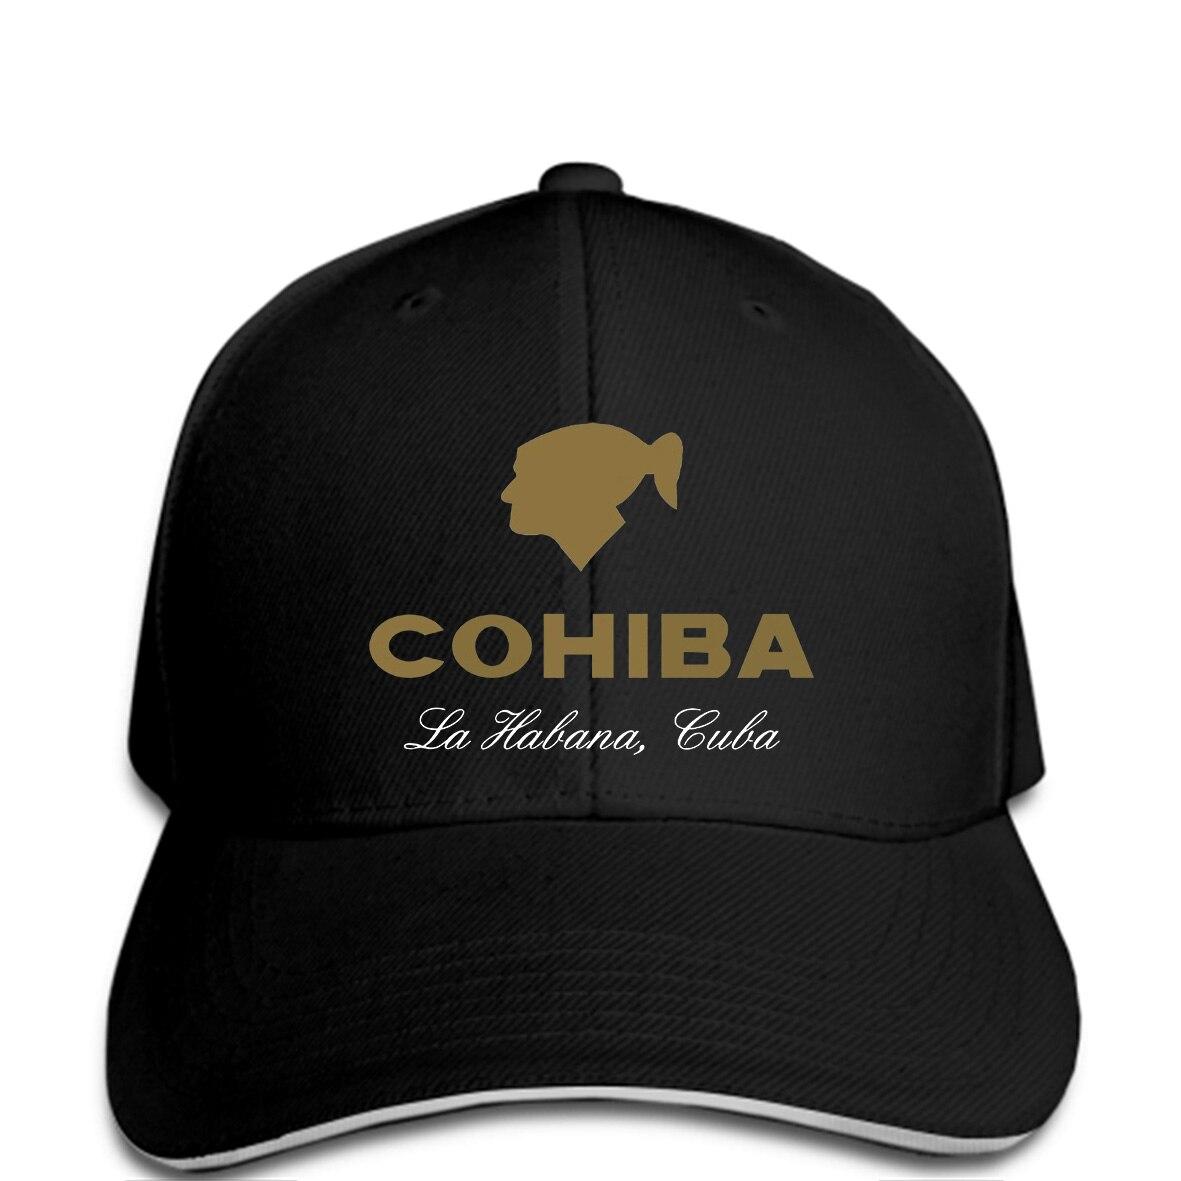 New Fashion Men Baseball Cap Cool Man Cohiba Cigar Humidor Havana Smoking Relax Quality Adult Hat Novelty Tsnapback Women Men's Hats